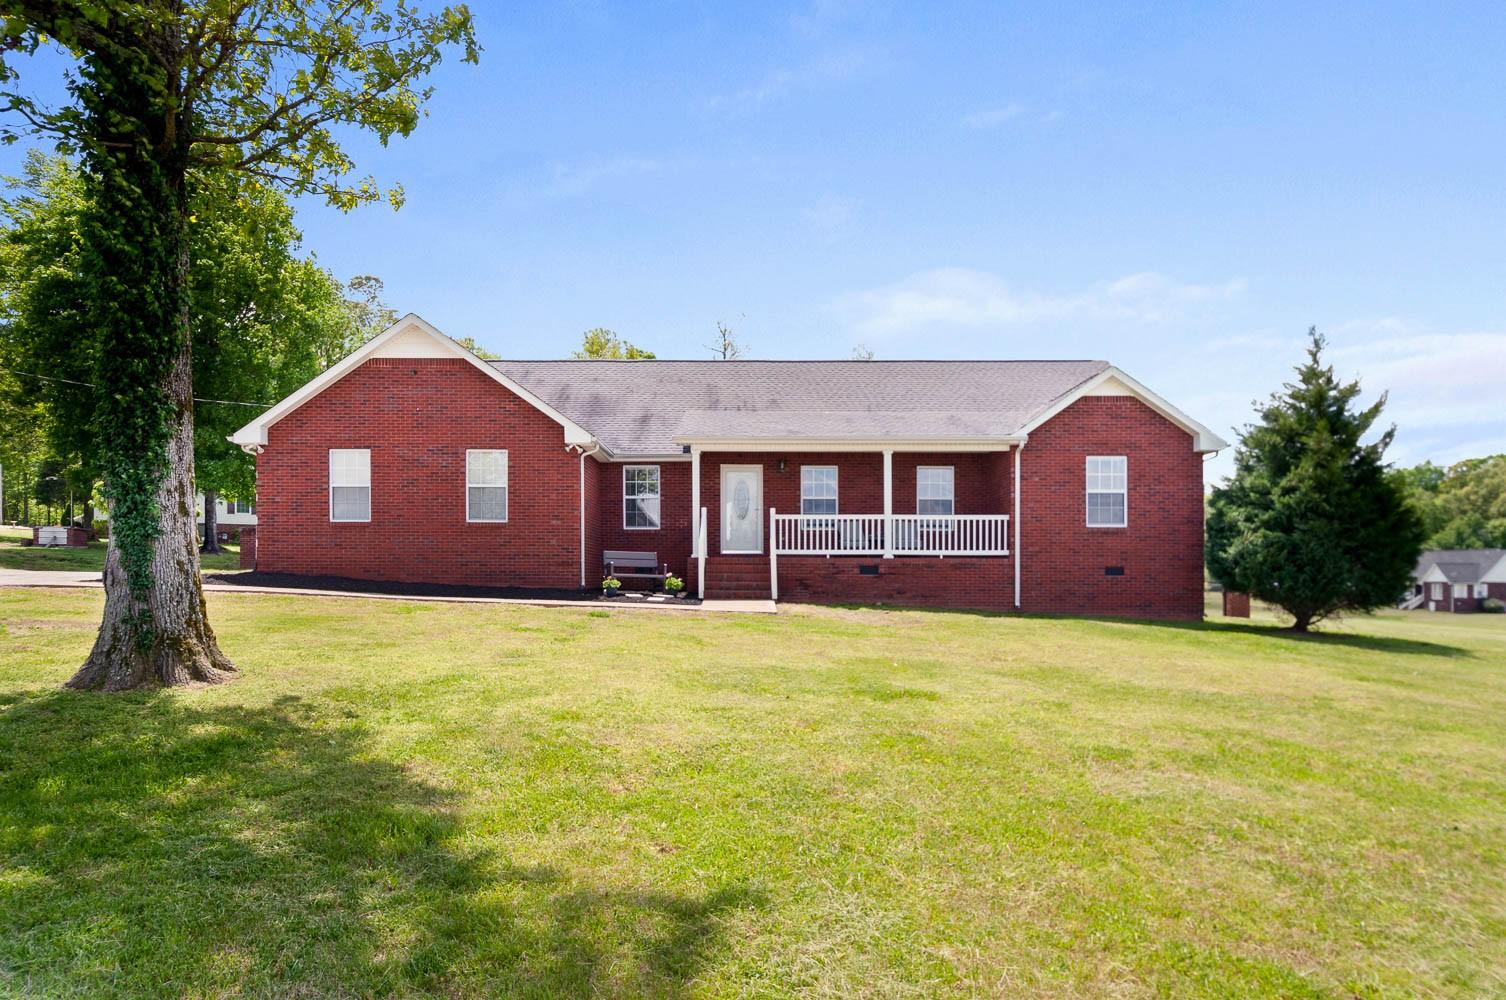 1718 Abiff Rd, Burns, TN 37029 - Burns, TN real estate listing